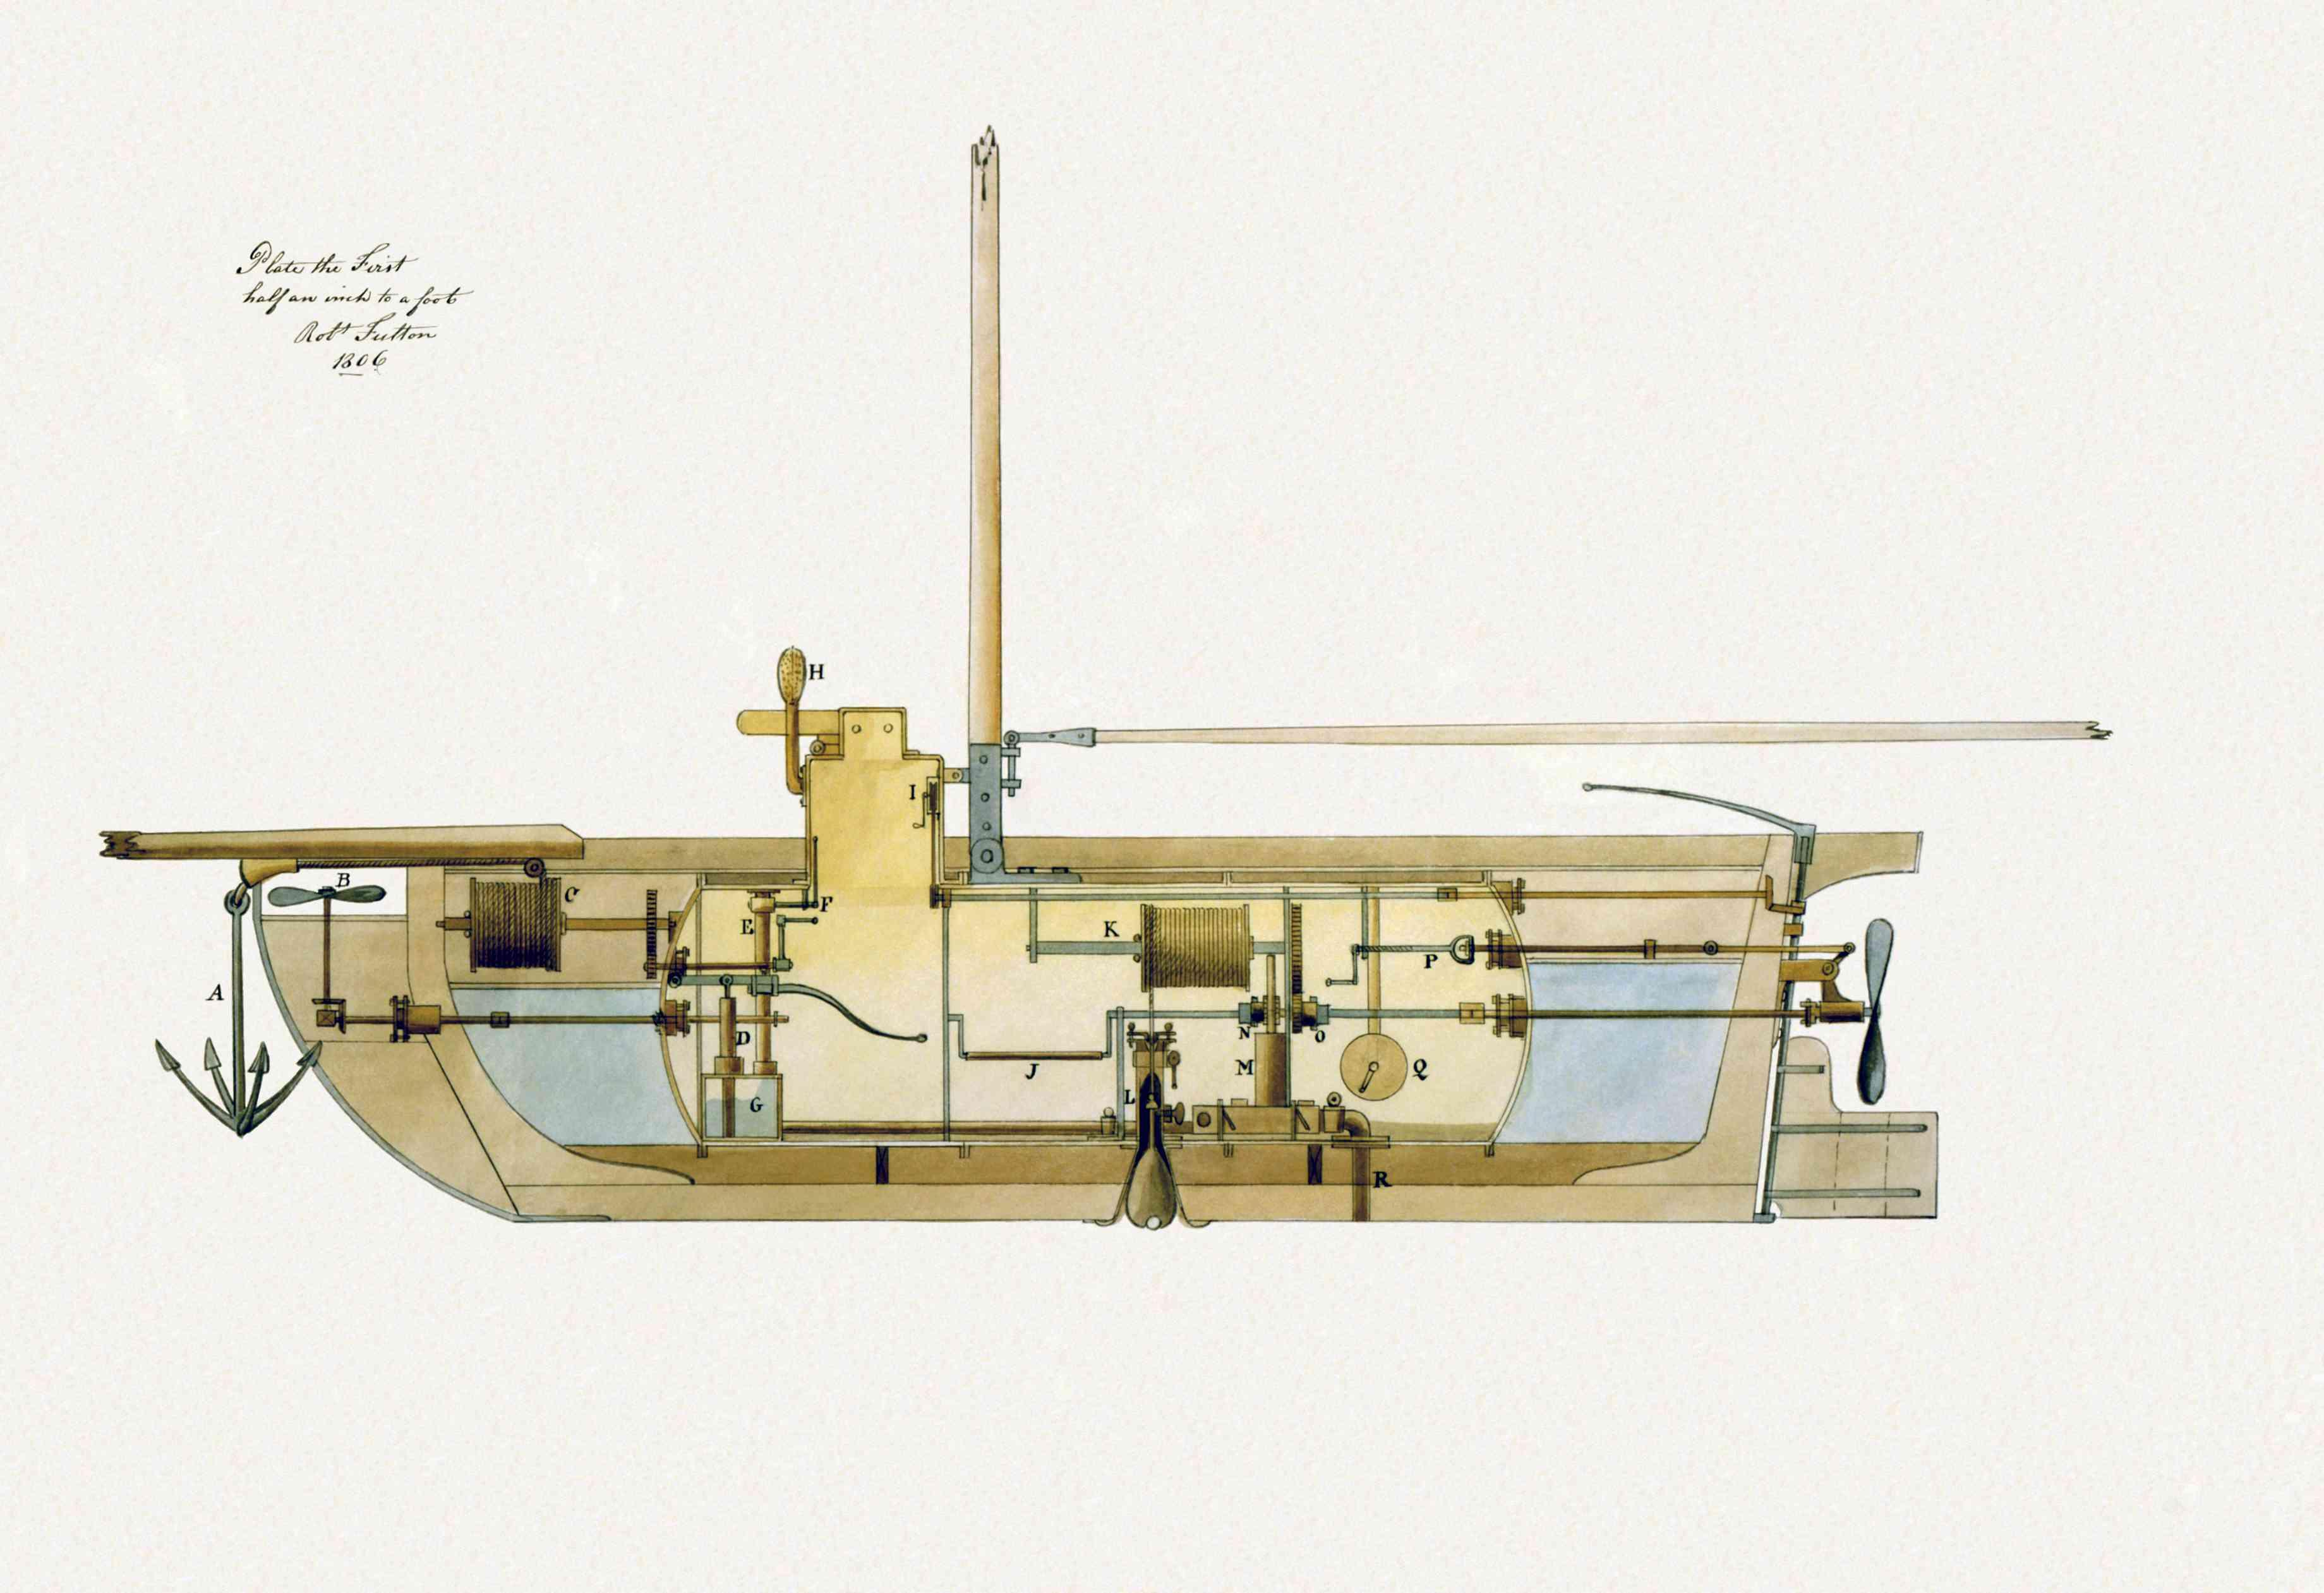 Drawing of inventor Robert Fulton's submarine Nautilus